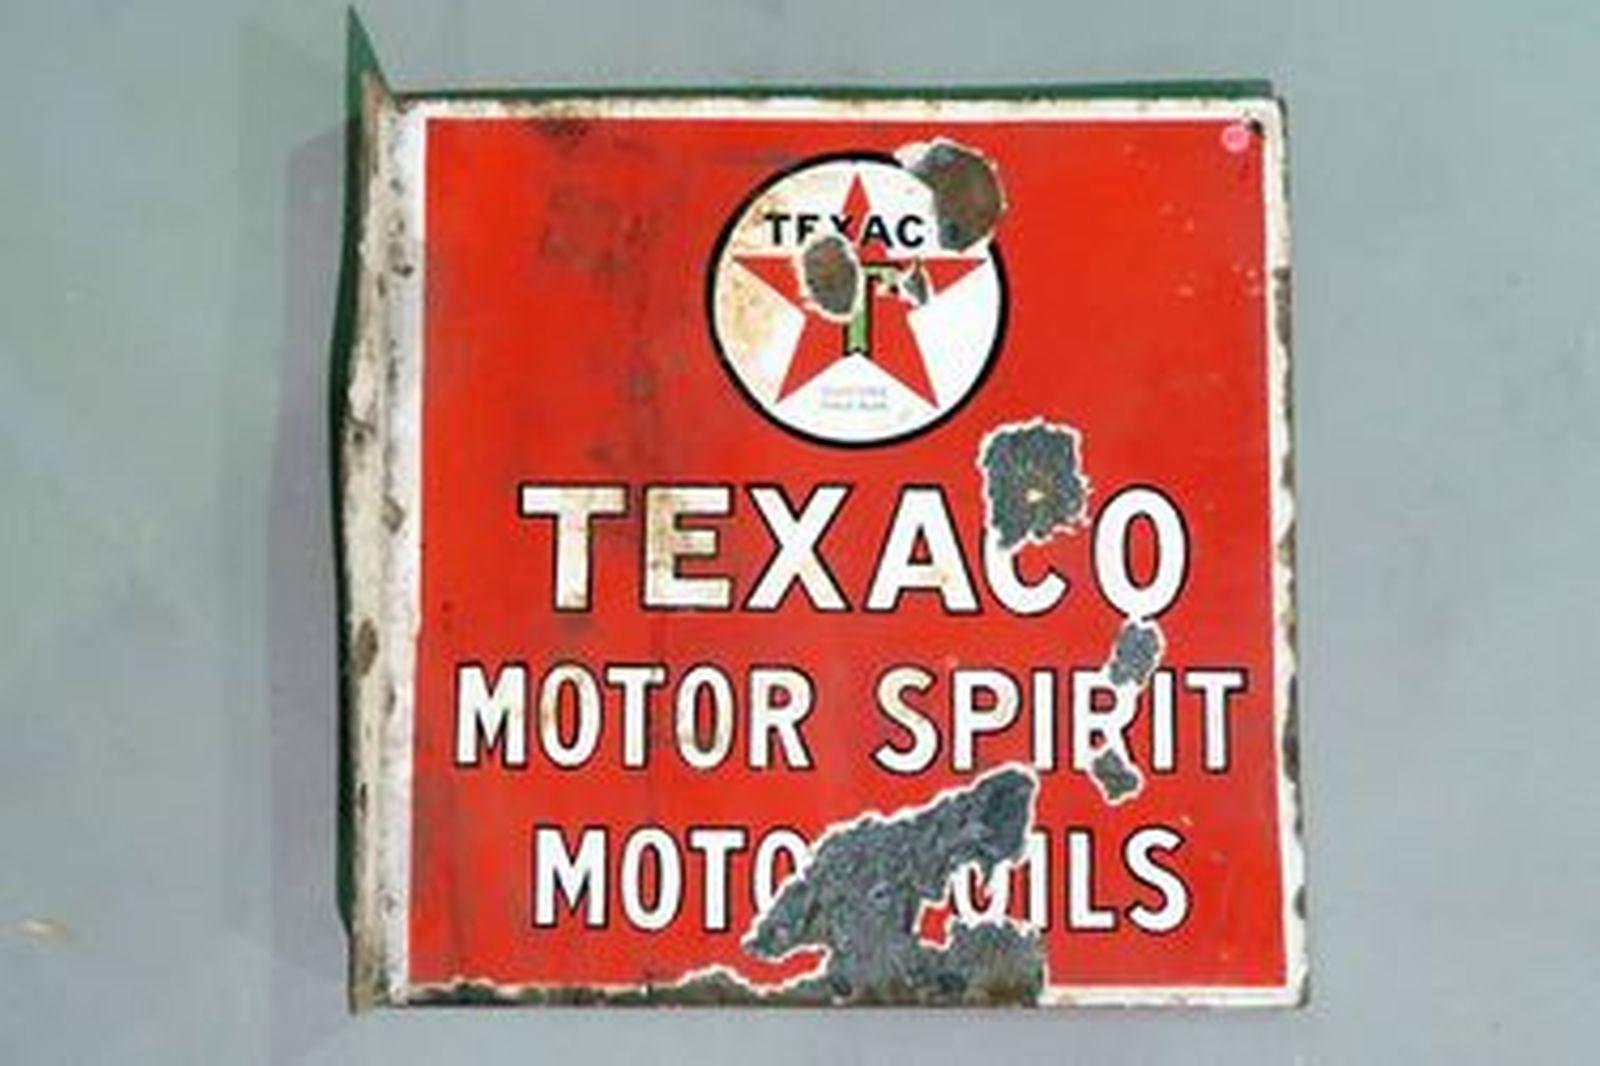 Enamel Sign - Texaco Motor Spirit Motor Oils Double Sided Wall Mount (46 x 46 cm)